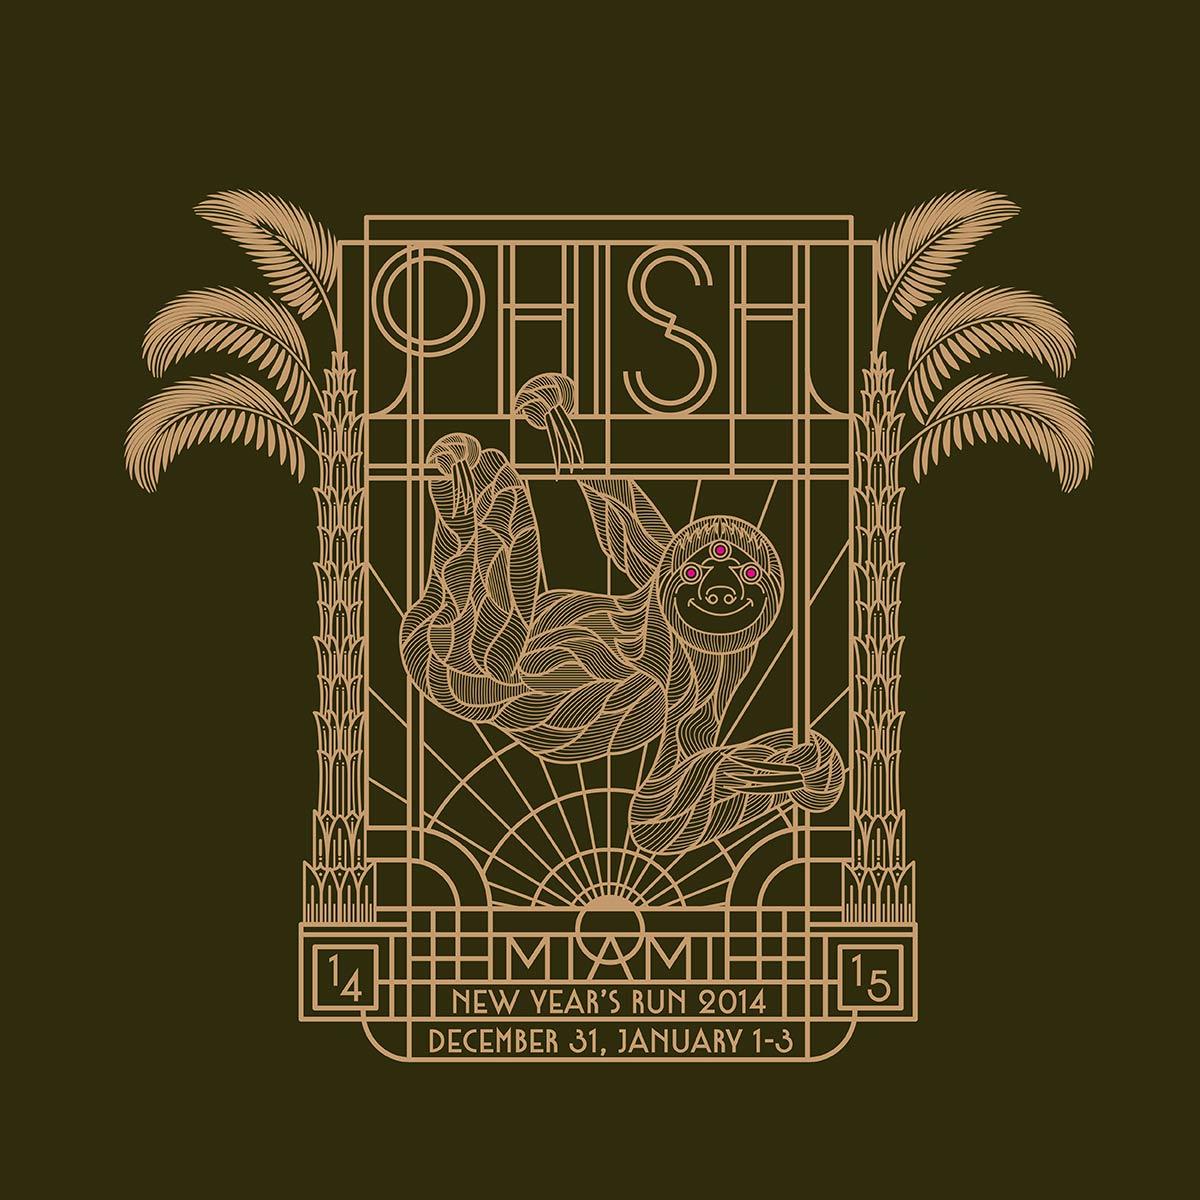 PHISH-STEELY-03.jpg